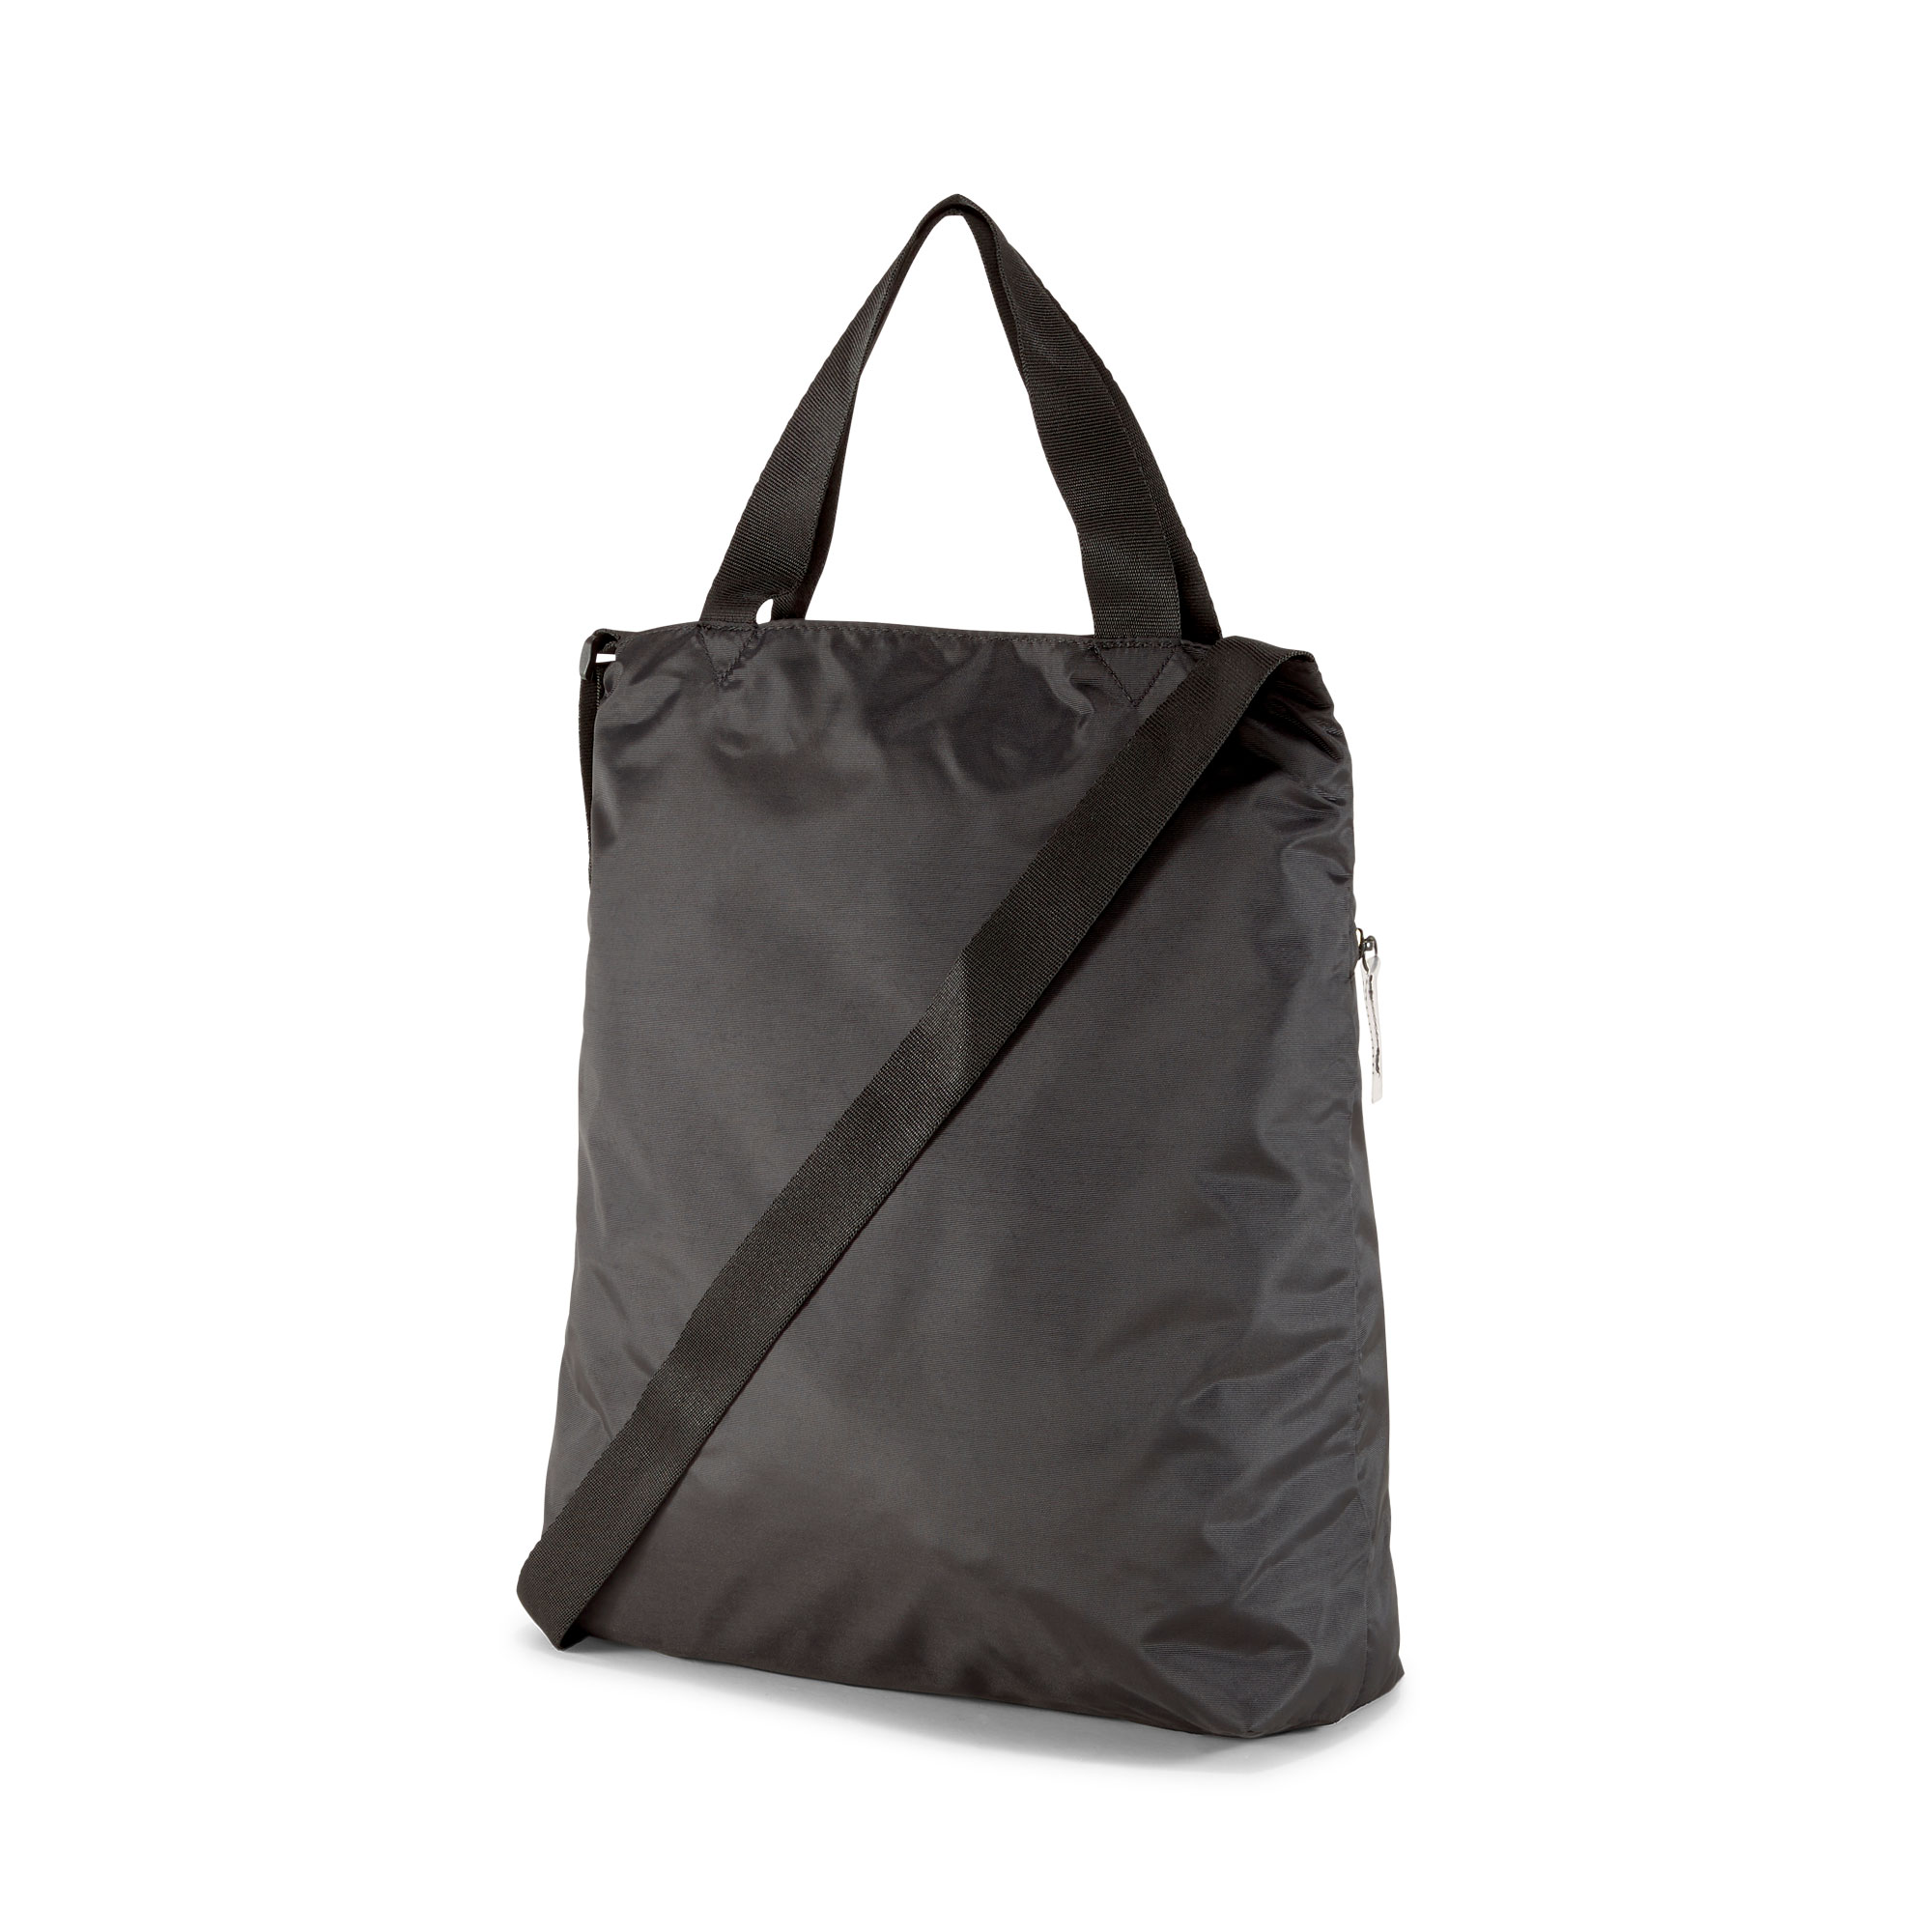 Puma WMN Core Seasonal Shopper Women's Bag 076965-01